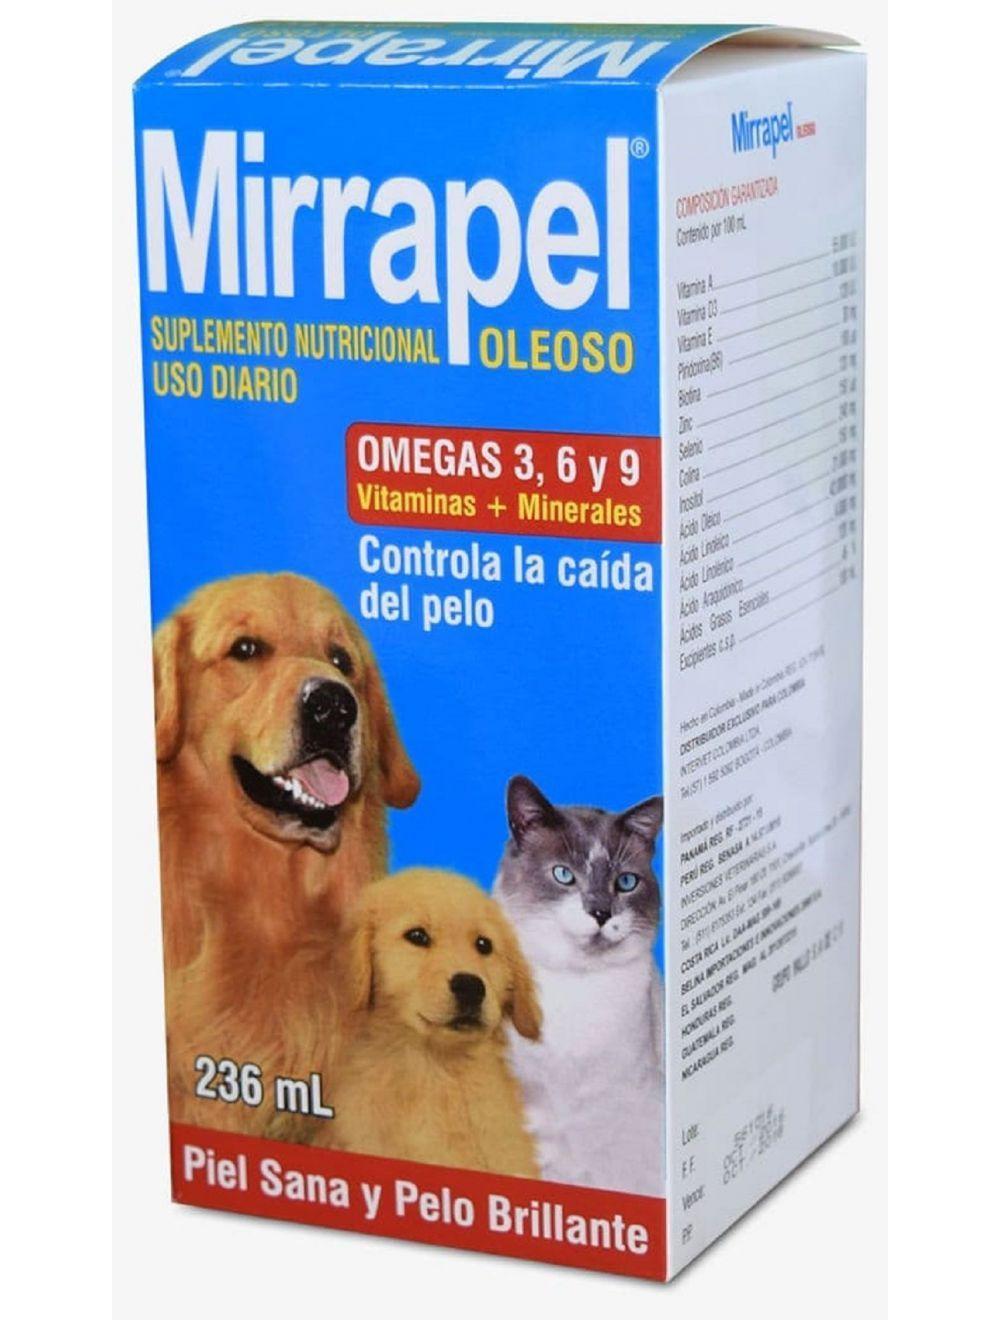 Mirrapel para Mascotas Oleoso Suplemento x 236 ml